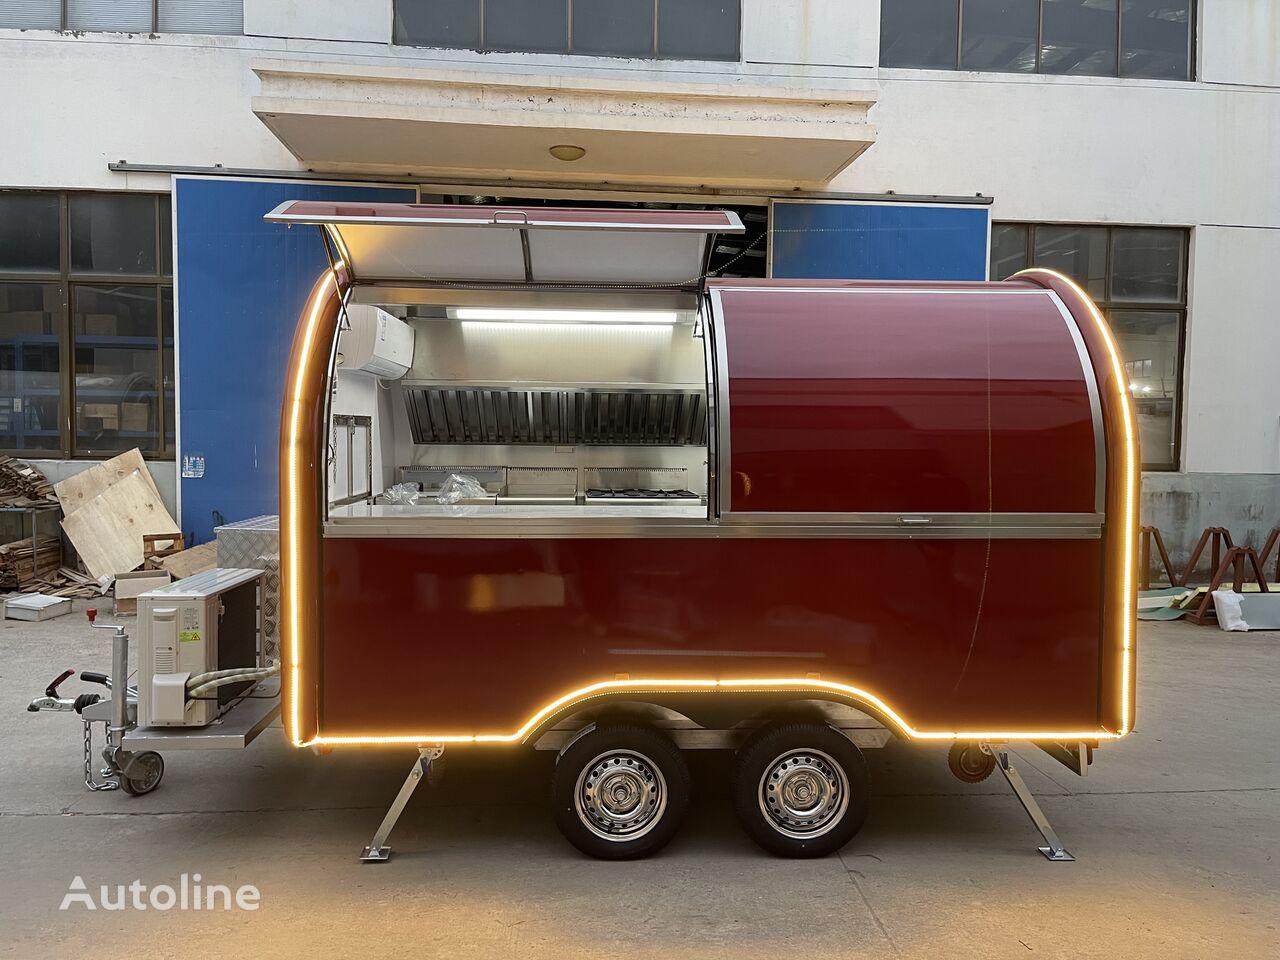 ERZODA Catering Trailer | Food Truck | Concession trailer | Food Traile vending trailer